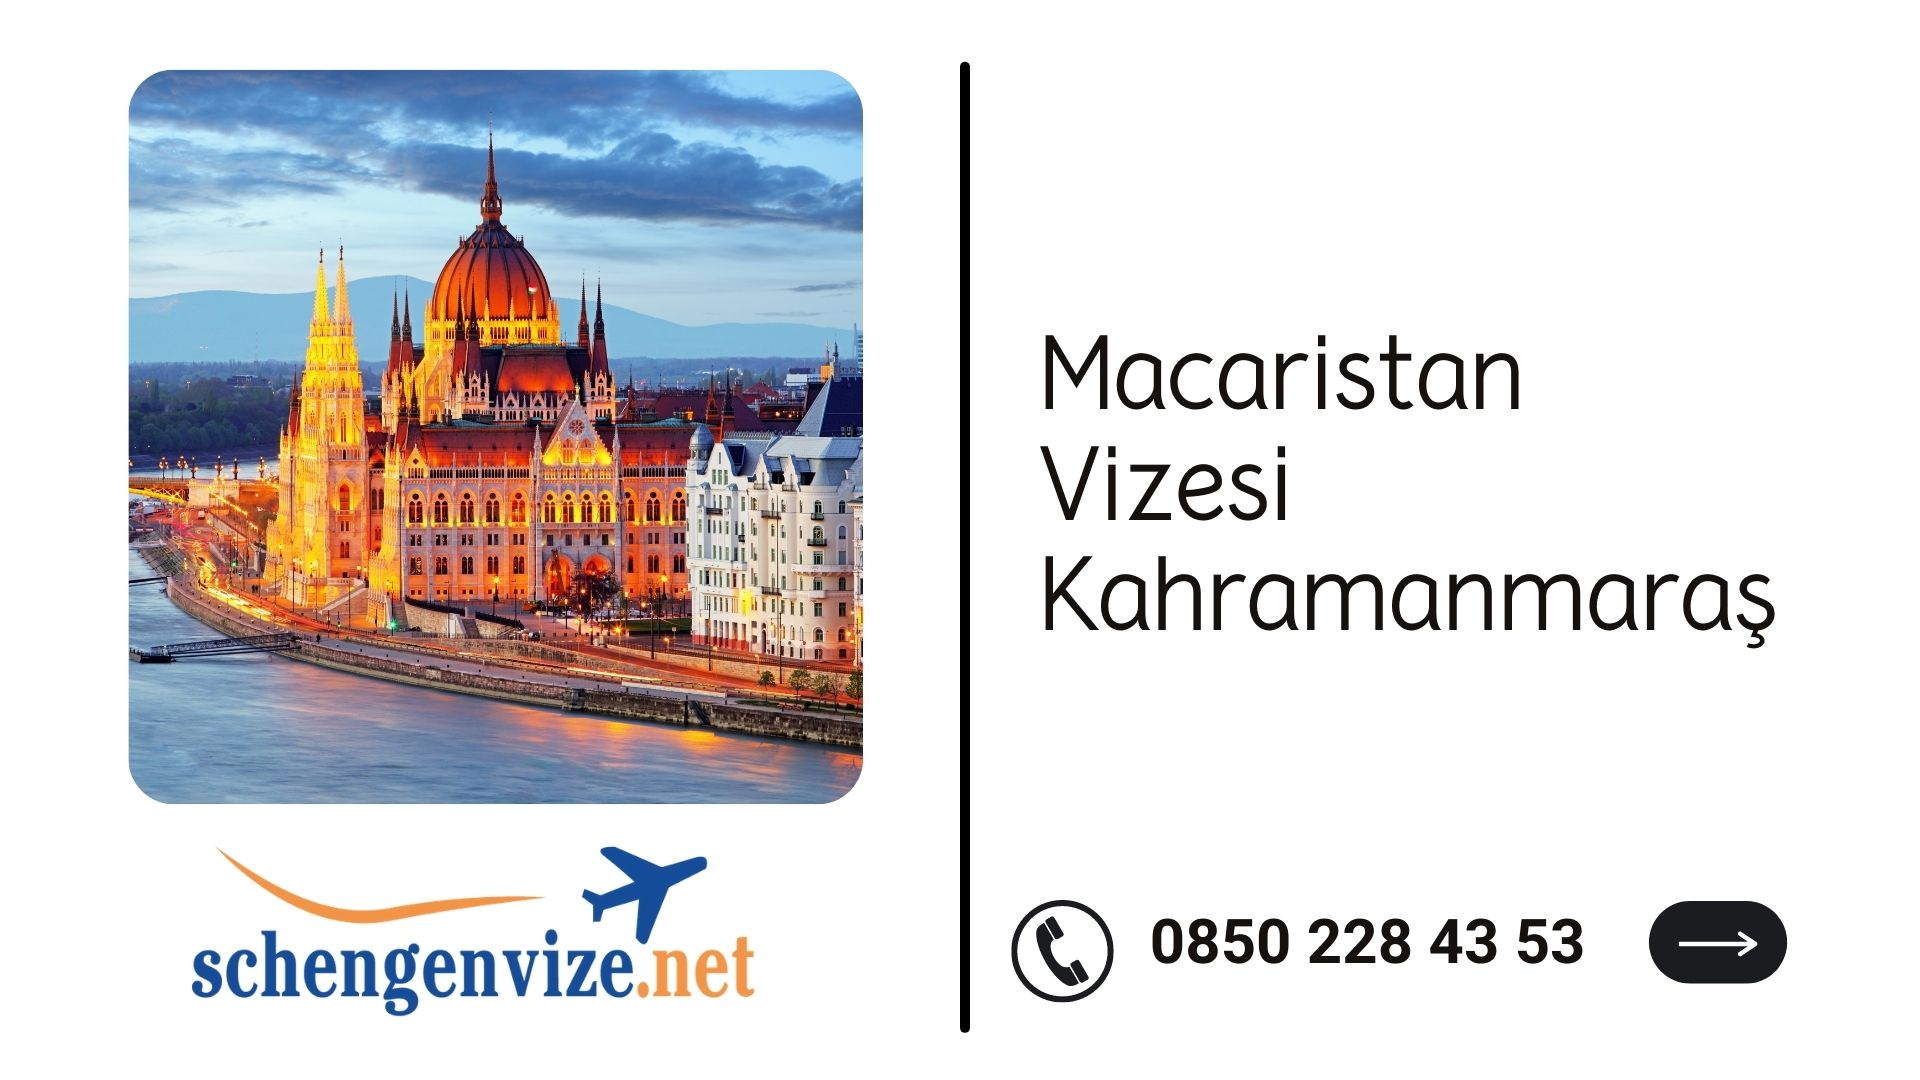 Macaristan Vizesi Kahramanmaraş